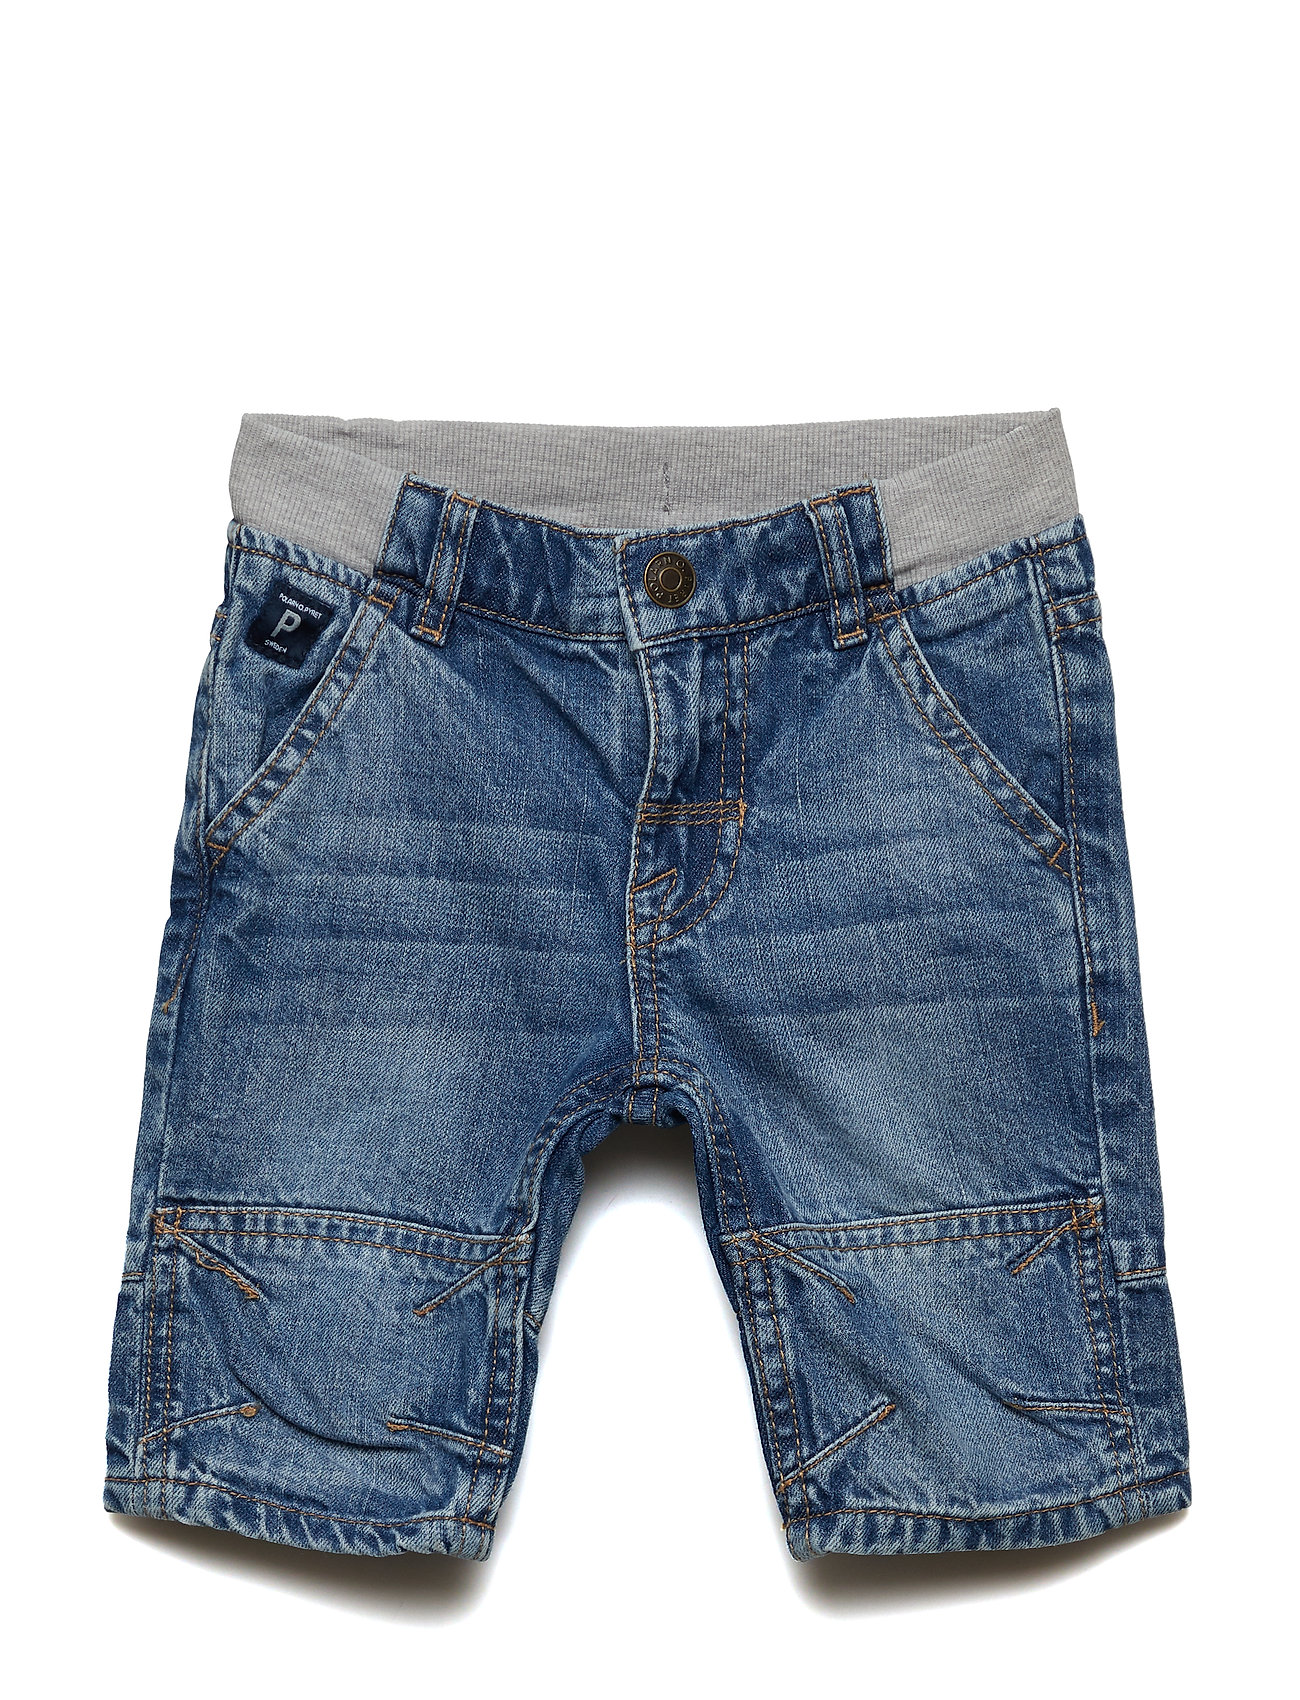 Polarn O. Pyret Shorts Denim Preshool